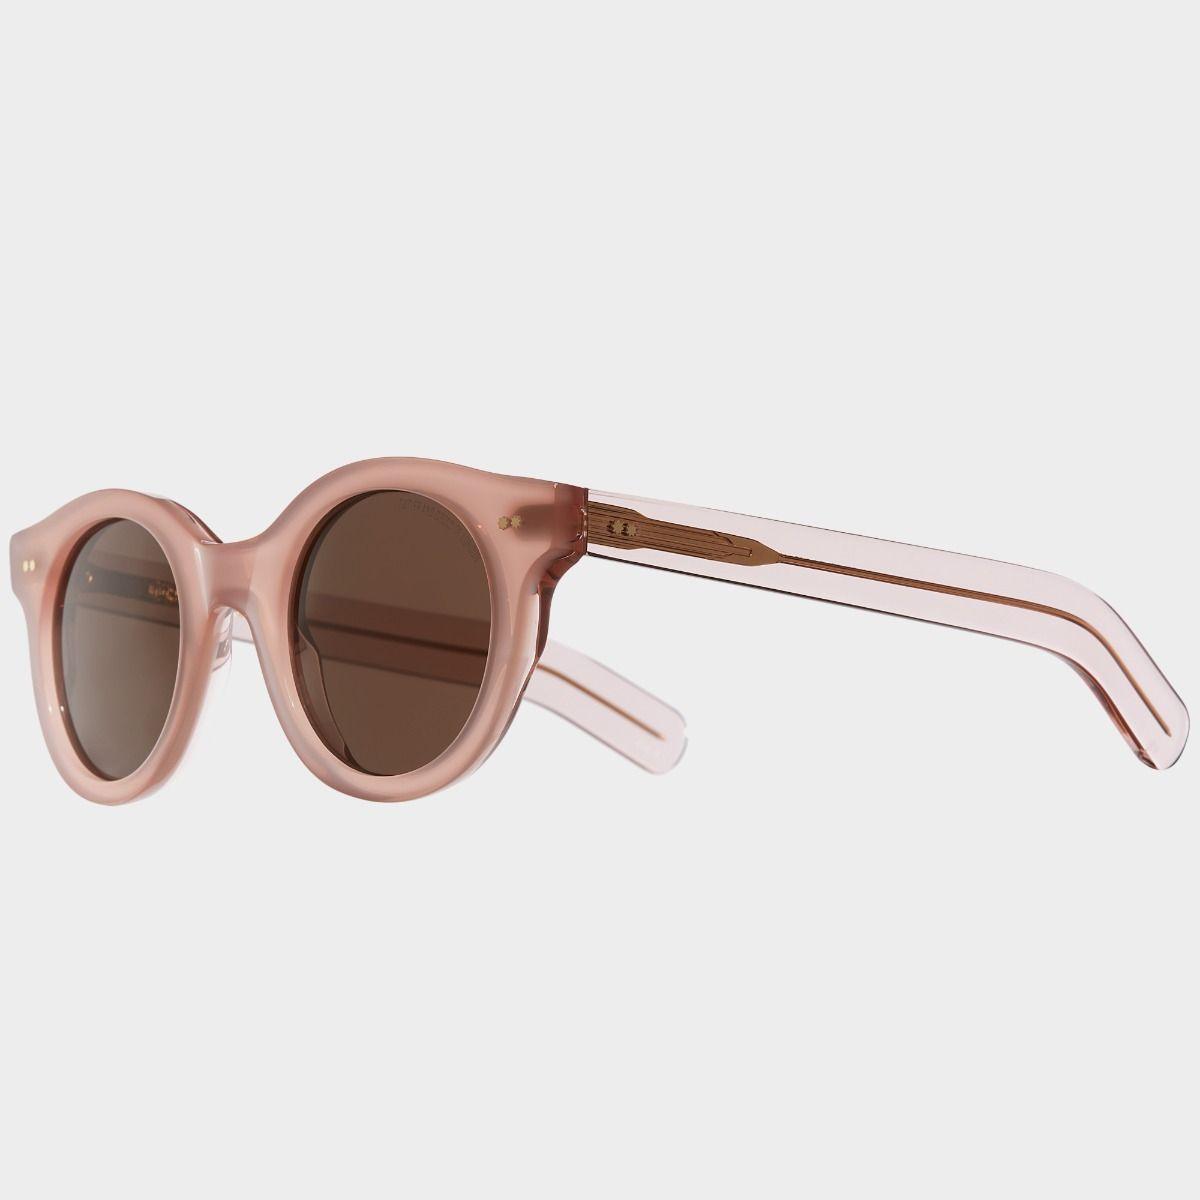 1390 Round Sunglasses